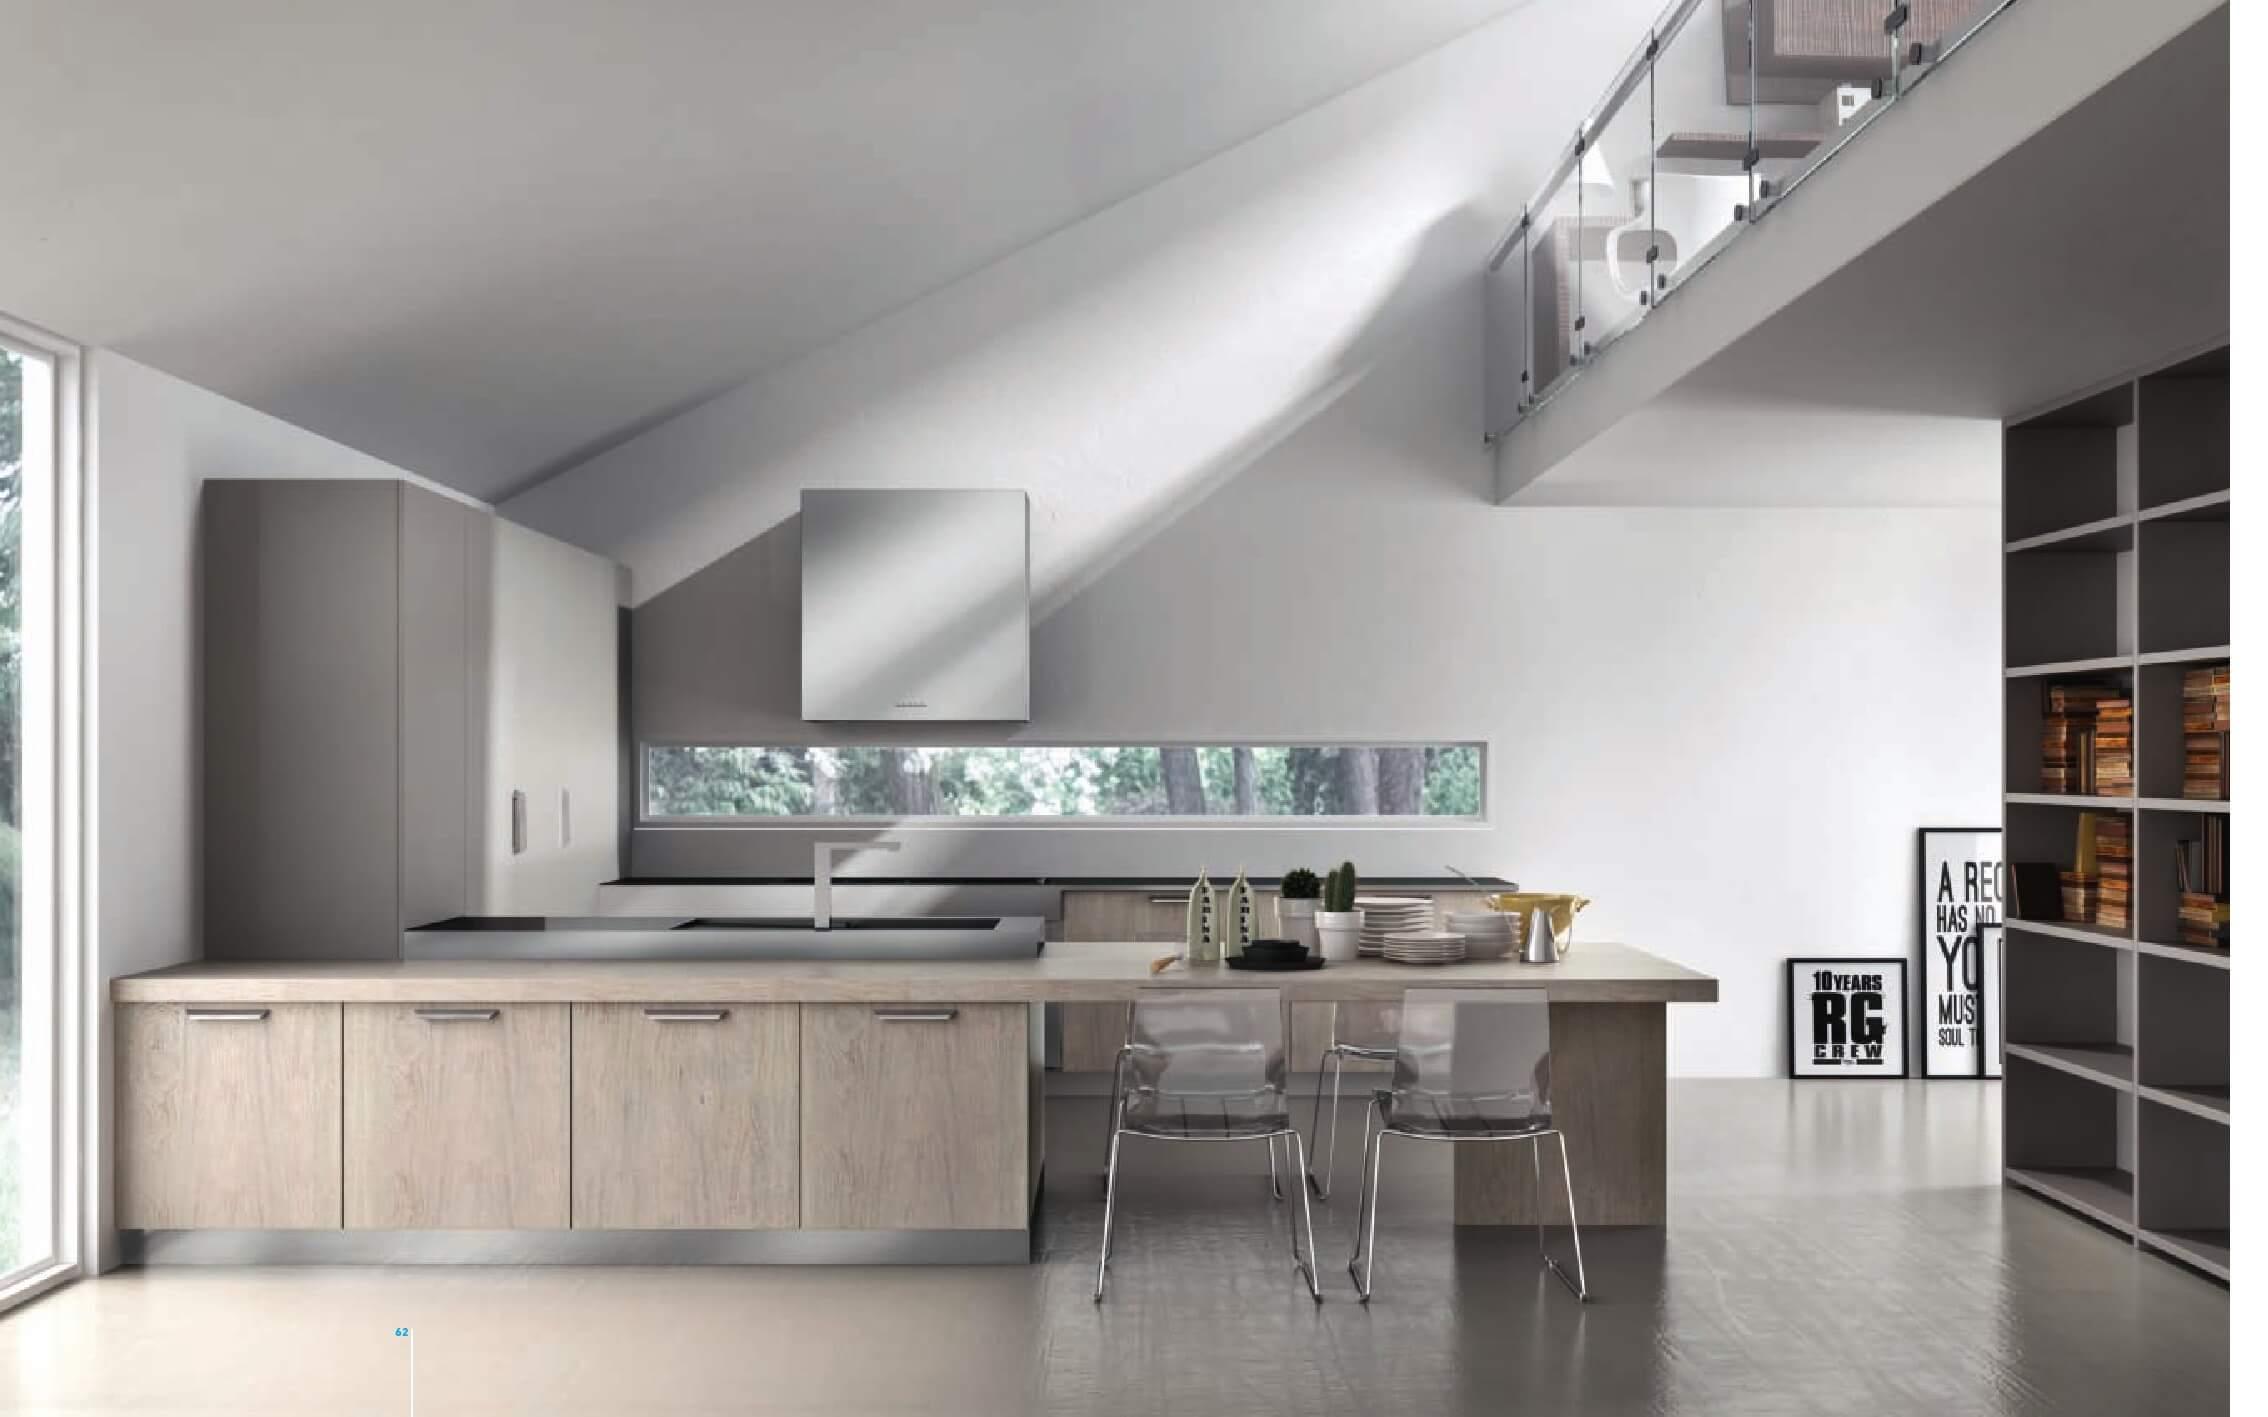 cuisiniste clermont ferrand cuisiniste clermont ferrand cuisiniste entre clermont cuisiniste. Black Bedroom Furniture Sets. Home Design Ideas